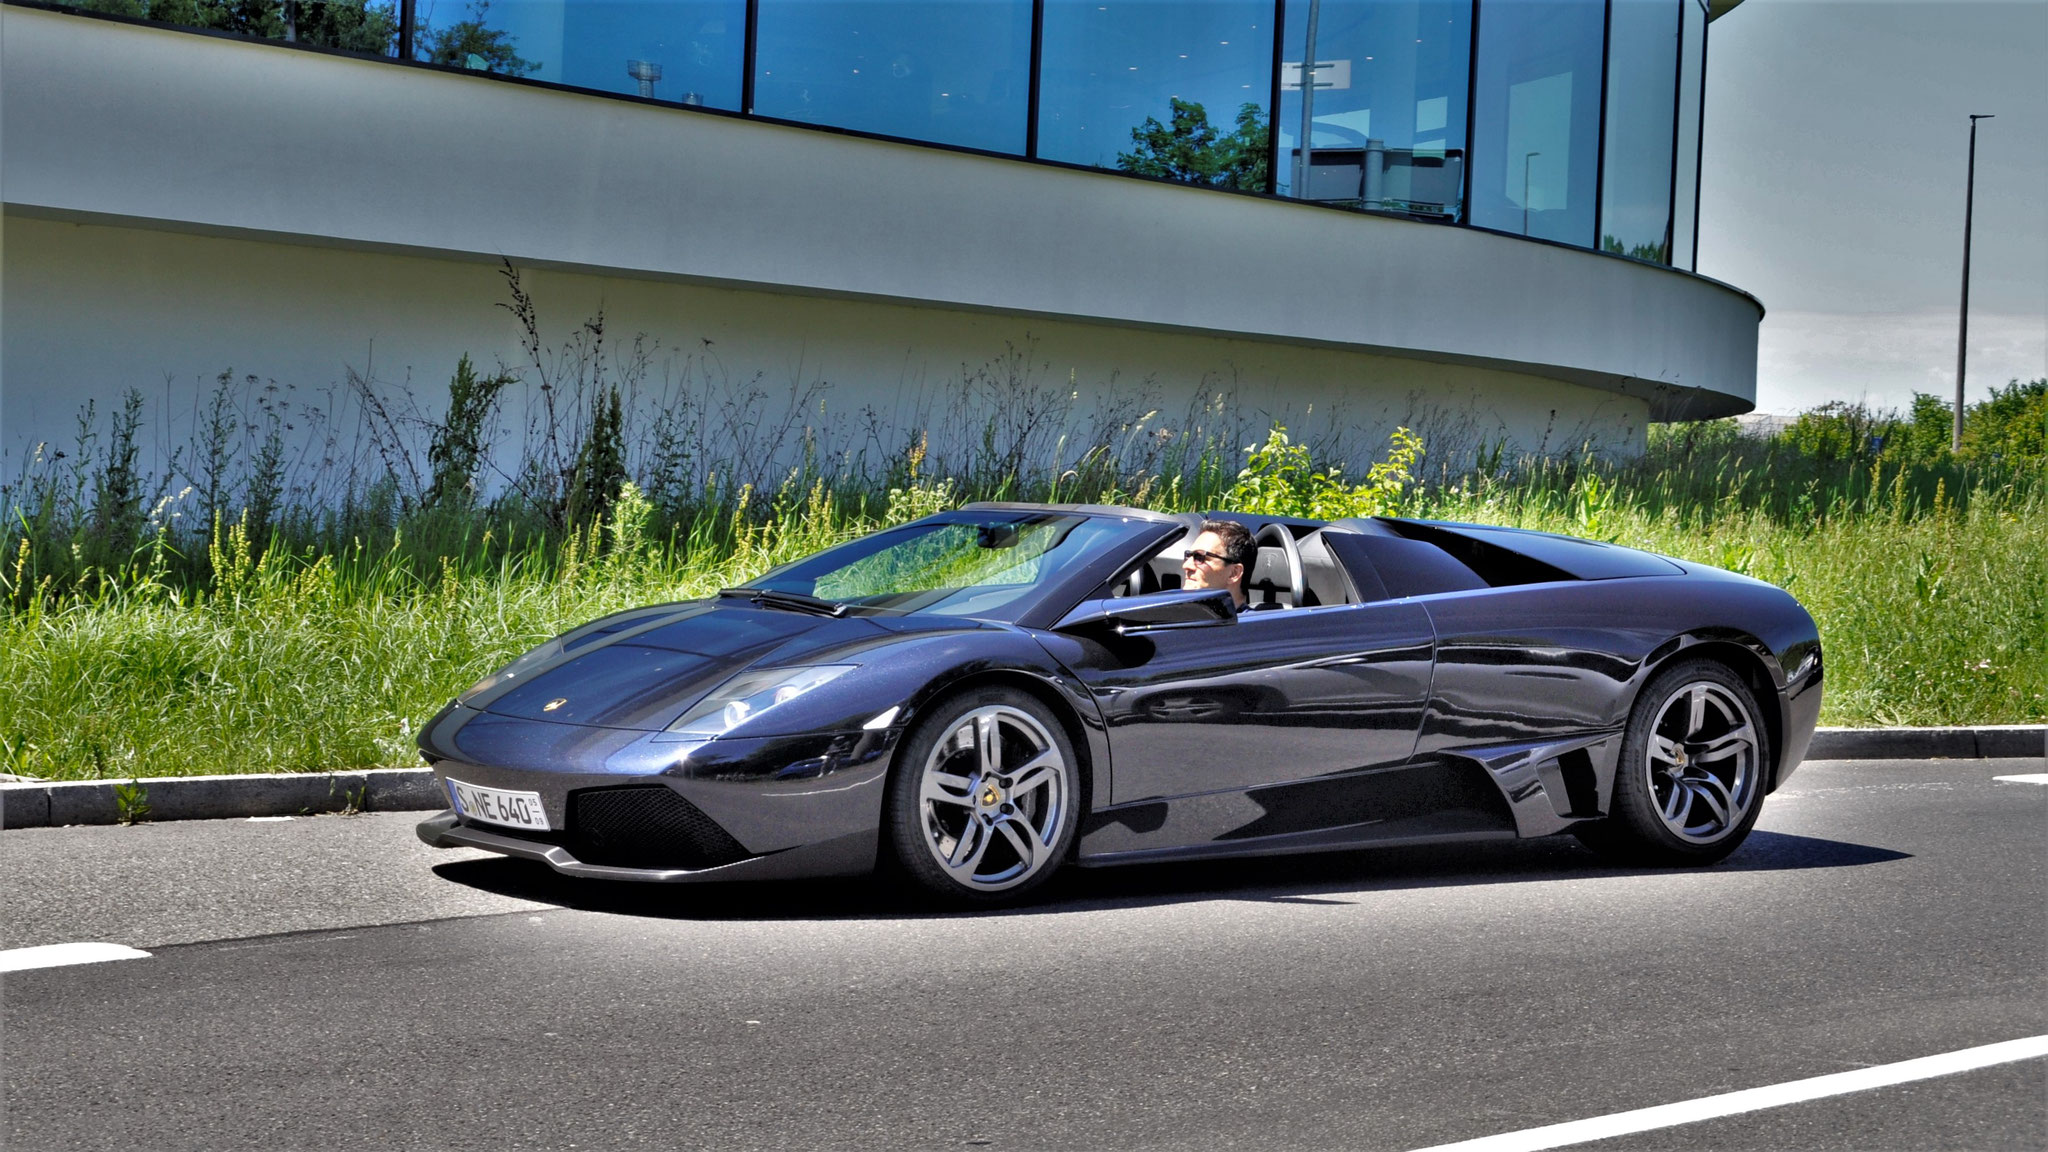 Lamborghini Murcielago Spyder - S-NE-640